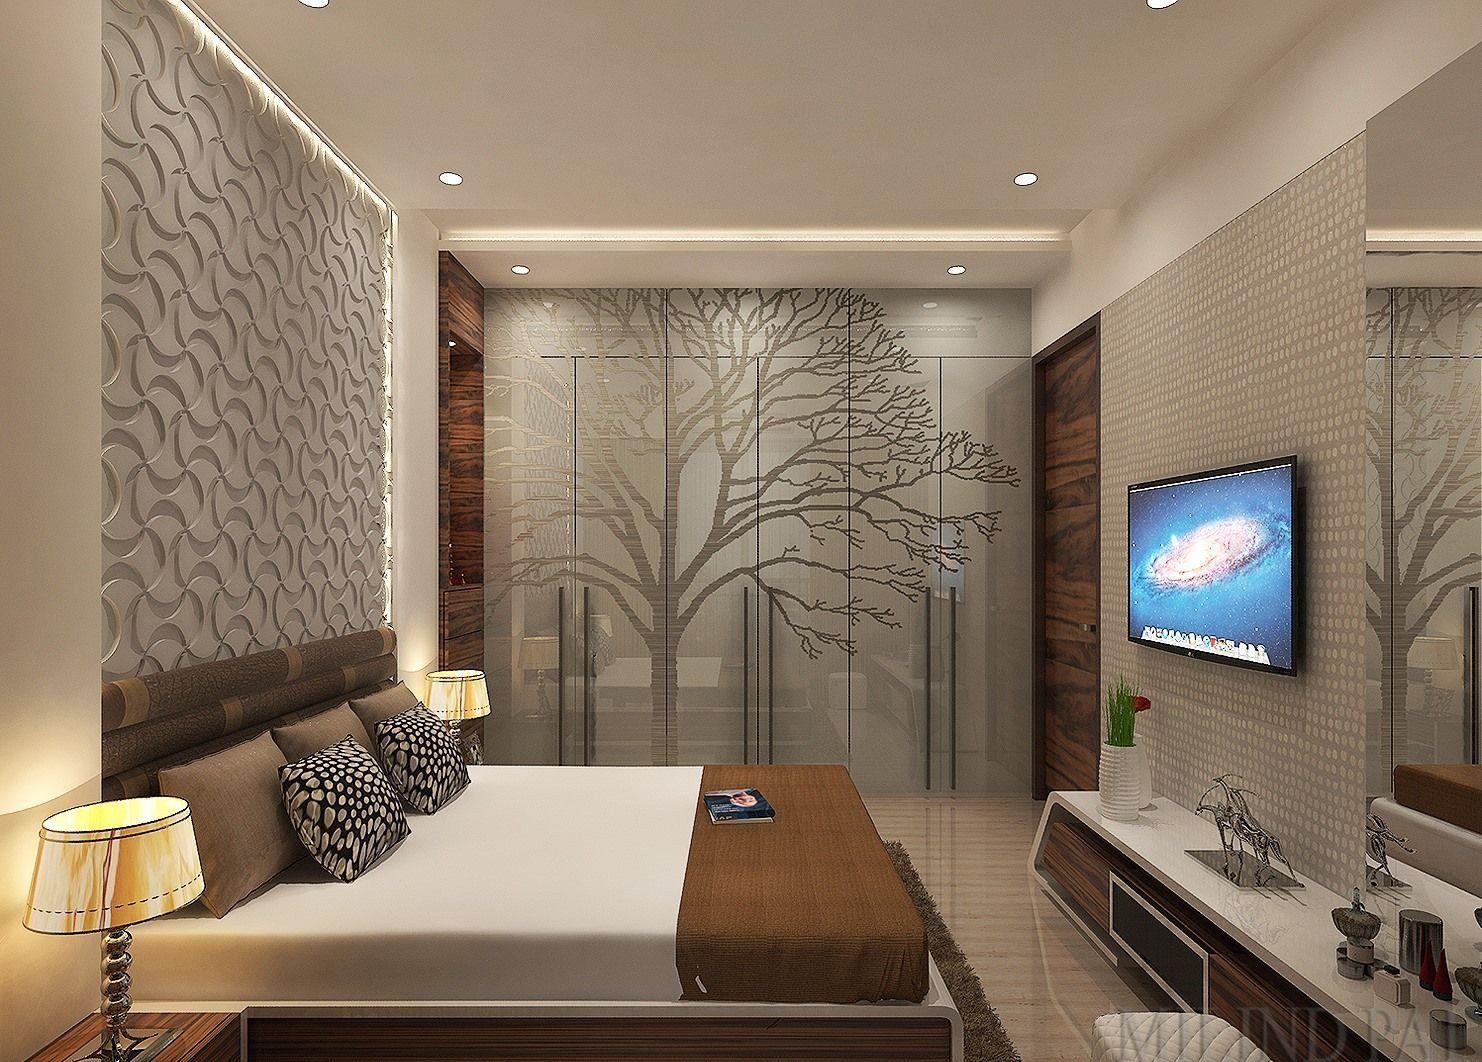 Living Room Bedroom Combination Beautiful This Room Has